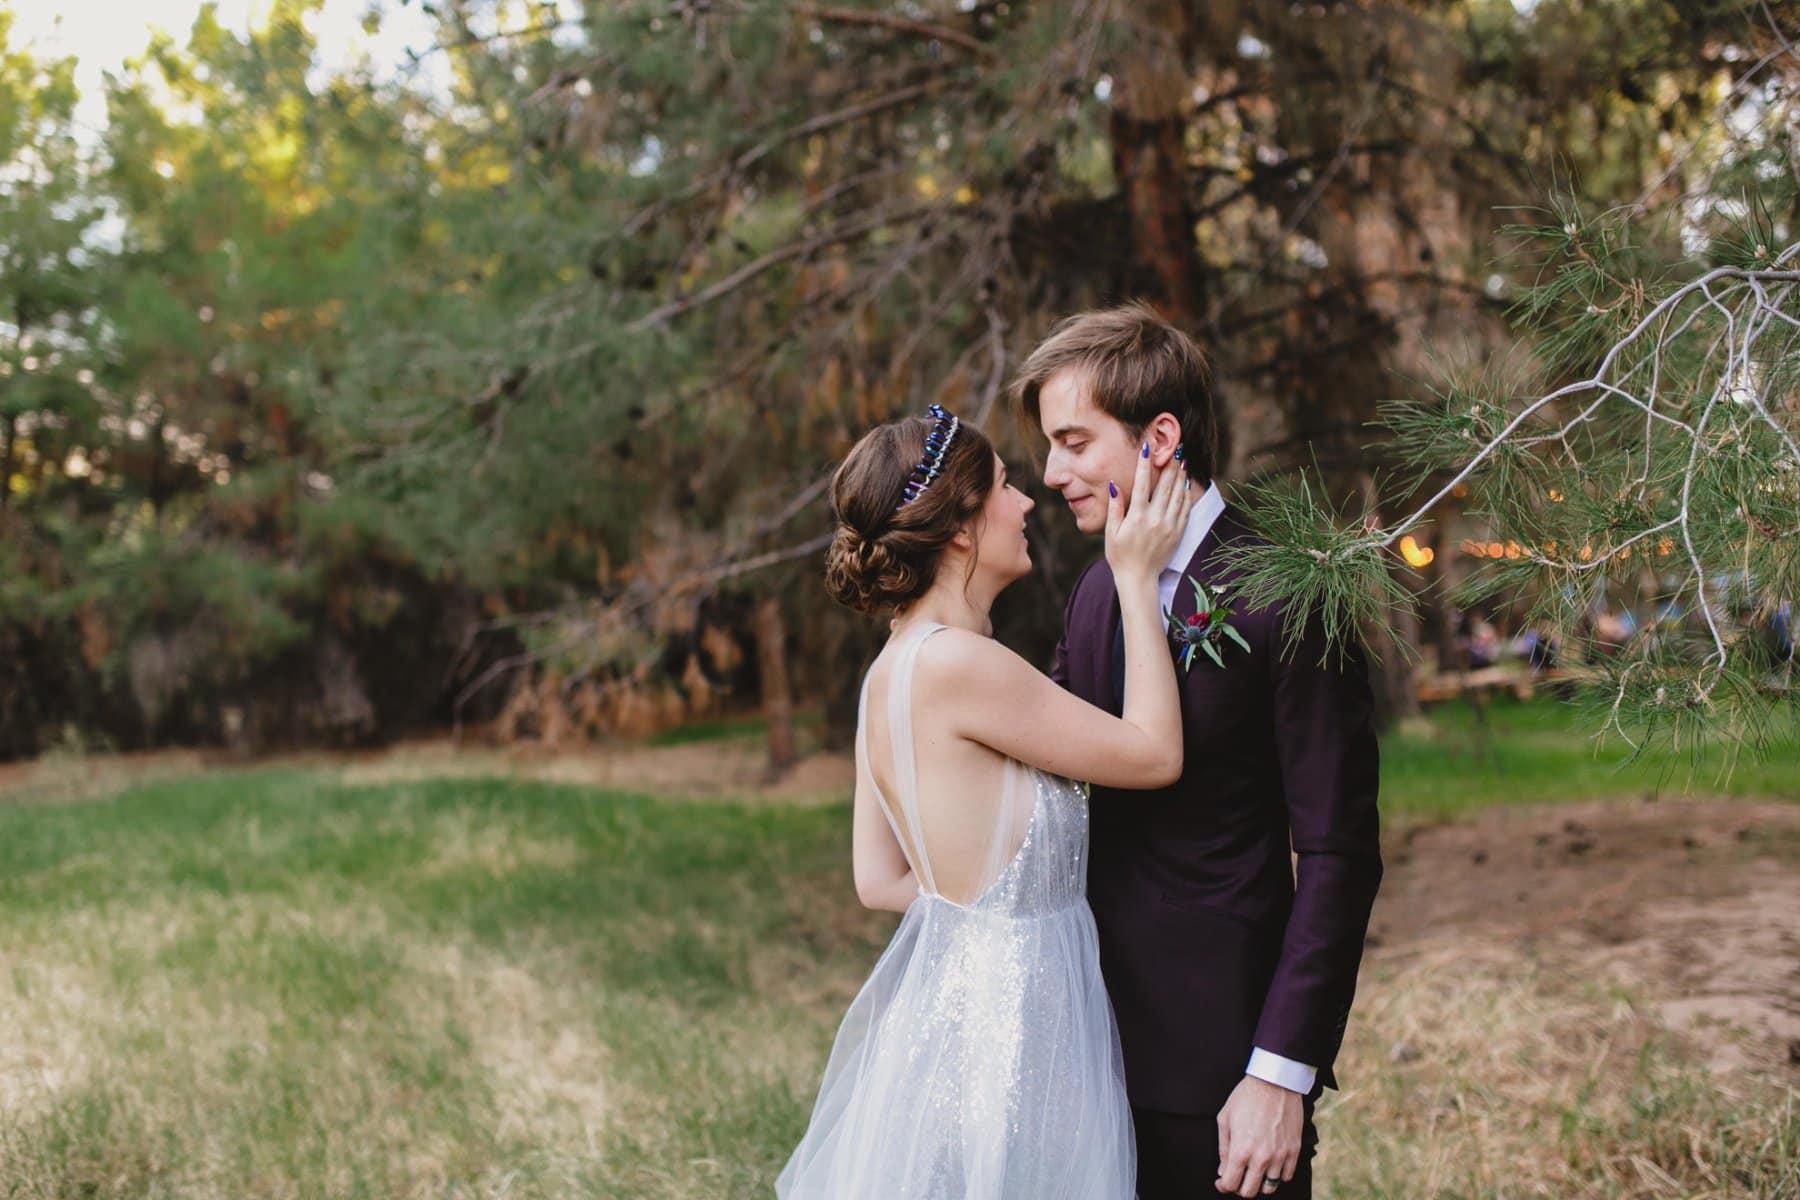 forest wedding in Phoenix venue Schnepf Farms the Meadow location